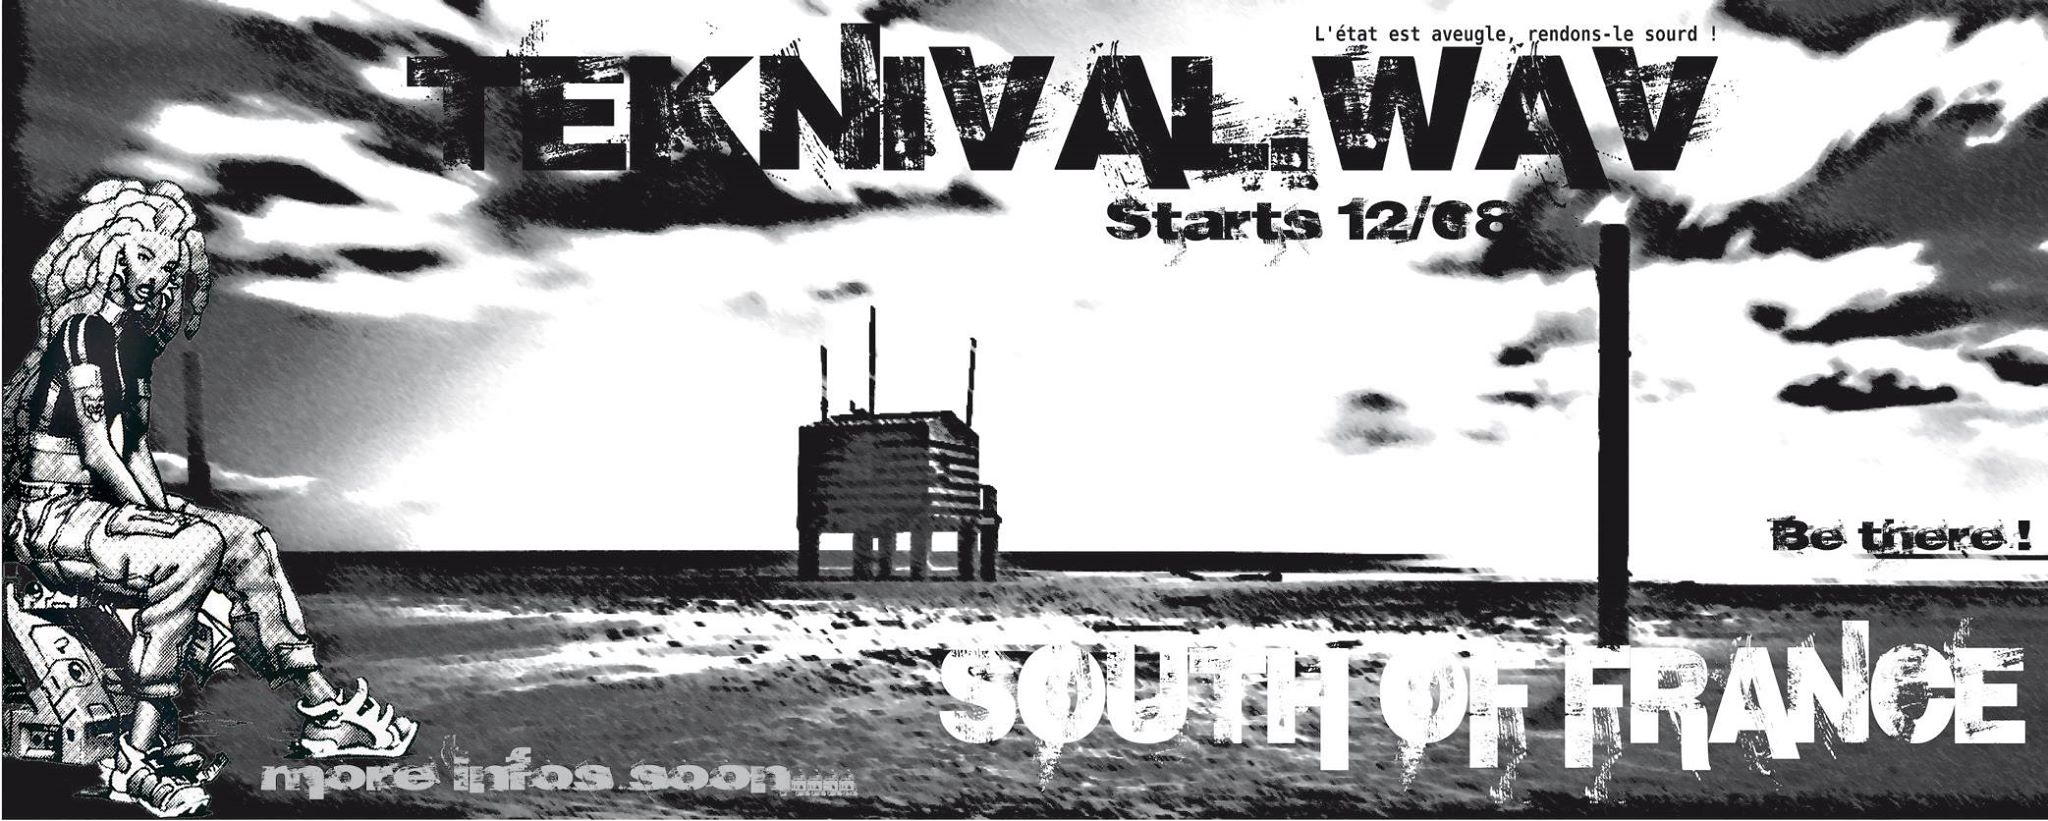 12 août : Teknival.wav, on ne bouge pas tant qu'on ne nous entend pas !